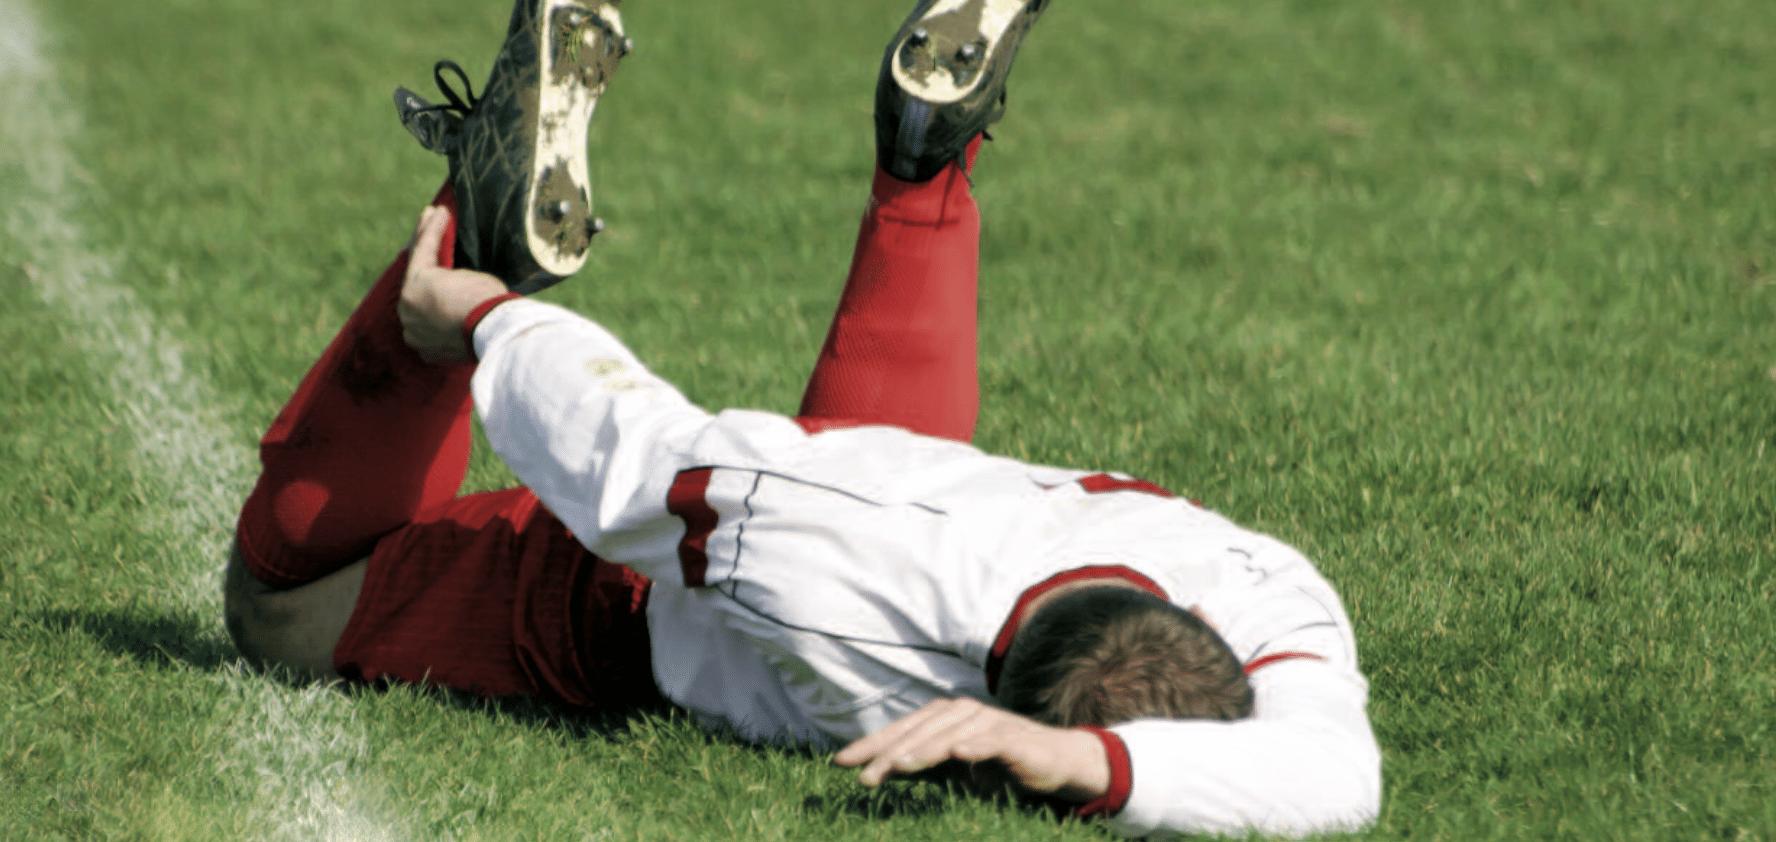 Soccer player sprain, strain, tear.